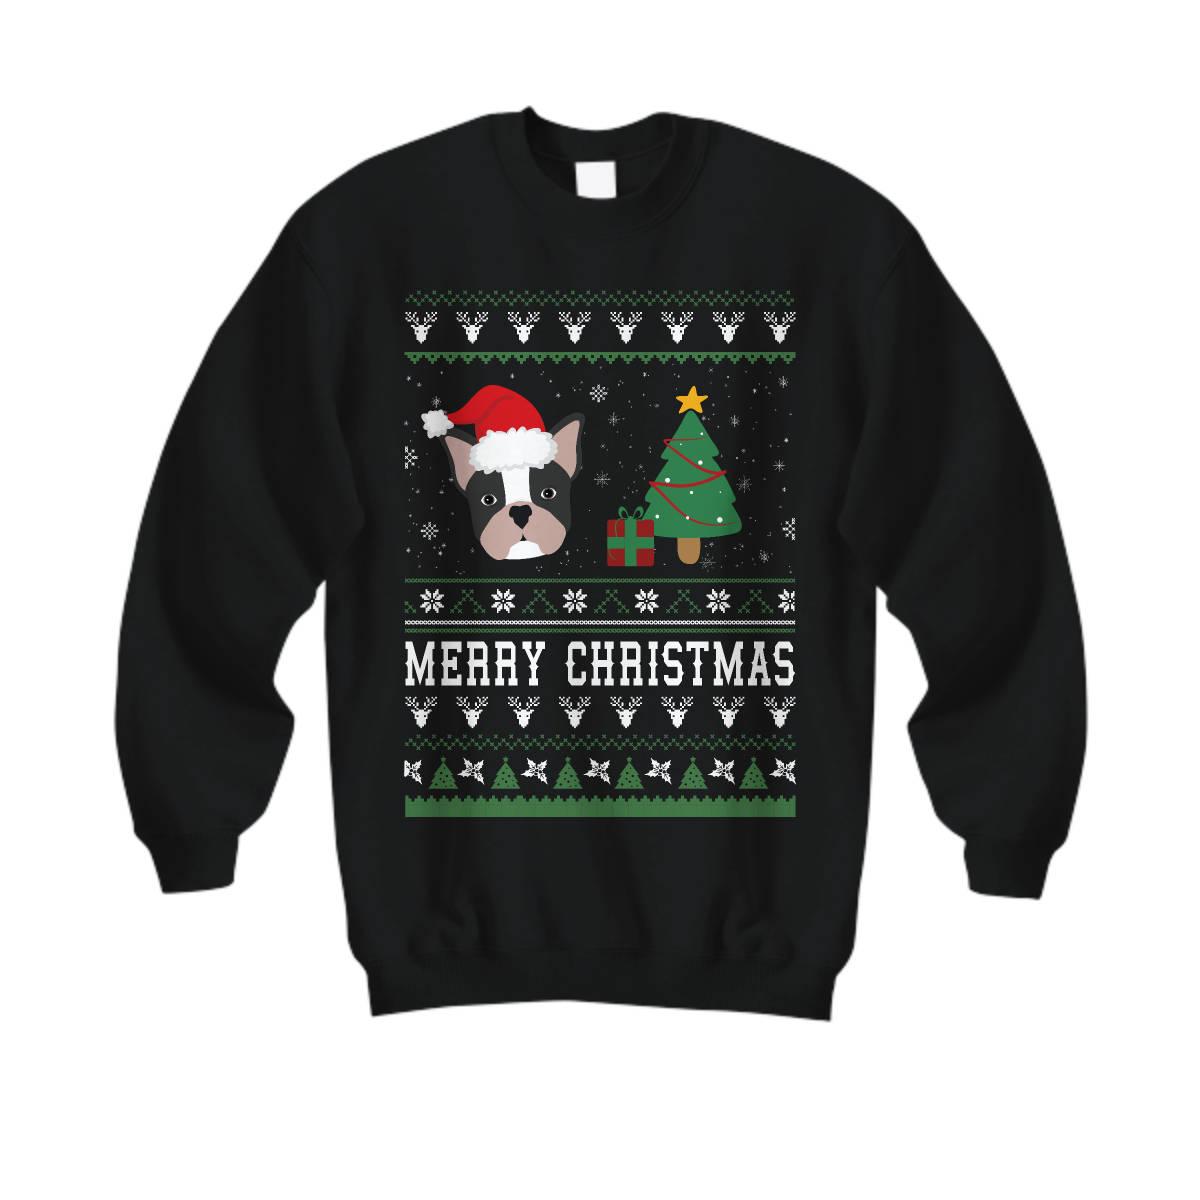 Merry Christmas Frenchie, French Bulldog Christmas Sweatshirt, Frenchie Sweater, French Bulldog Shirt, French Bulldog, French Bulldog Gifts,